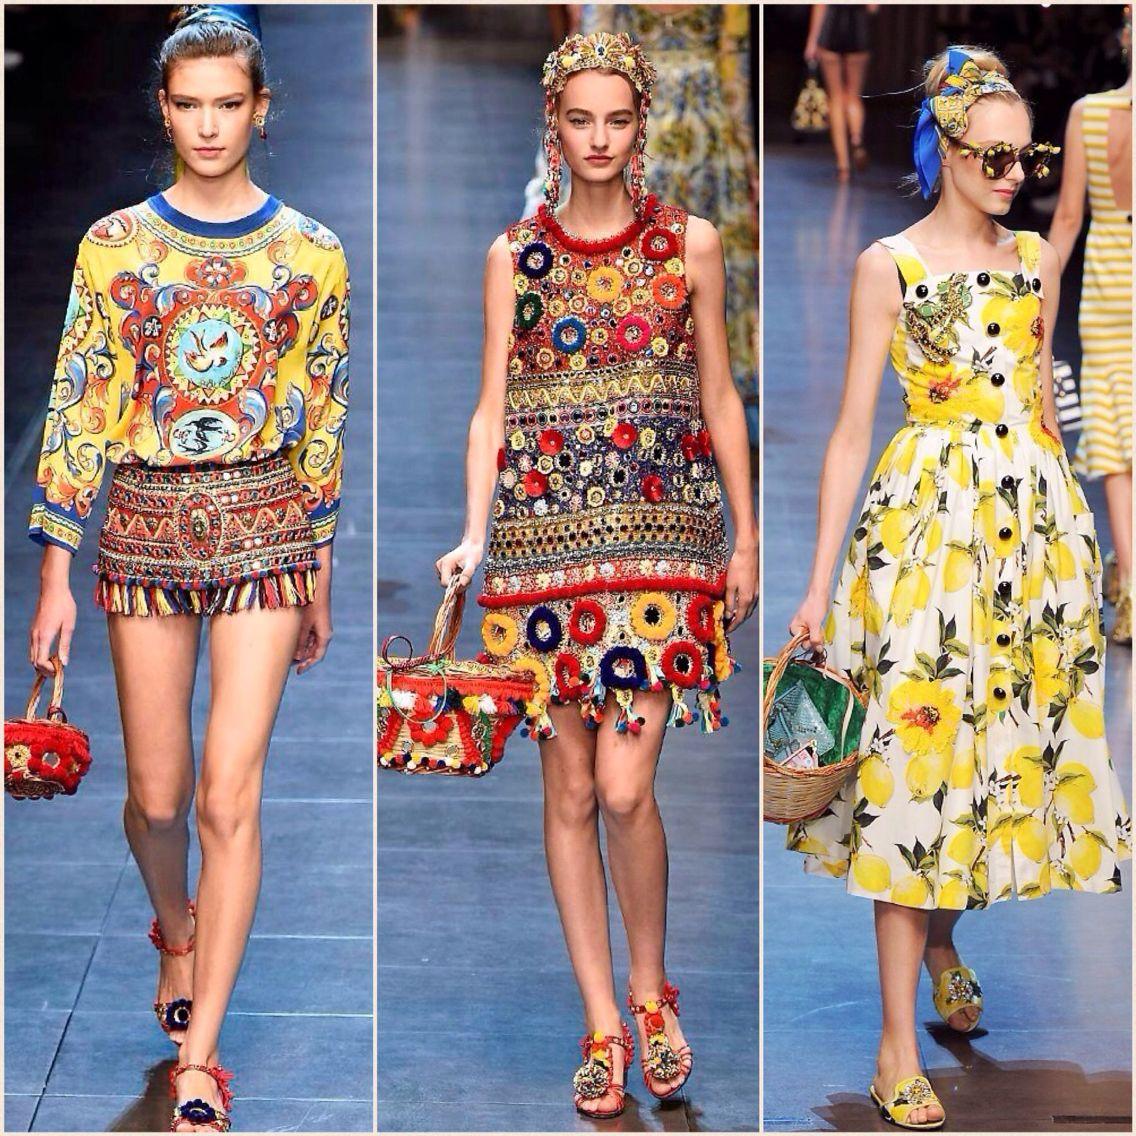 2aba624ccc65 Pom Pom hand bag   dress by Dolce   Gabbana SS2016. Shop our Sicily Bags  and spread the Pom Pom love. sicilybag.com